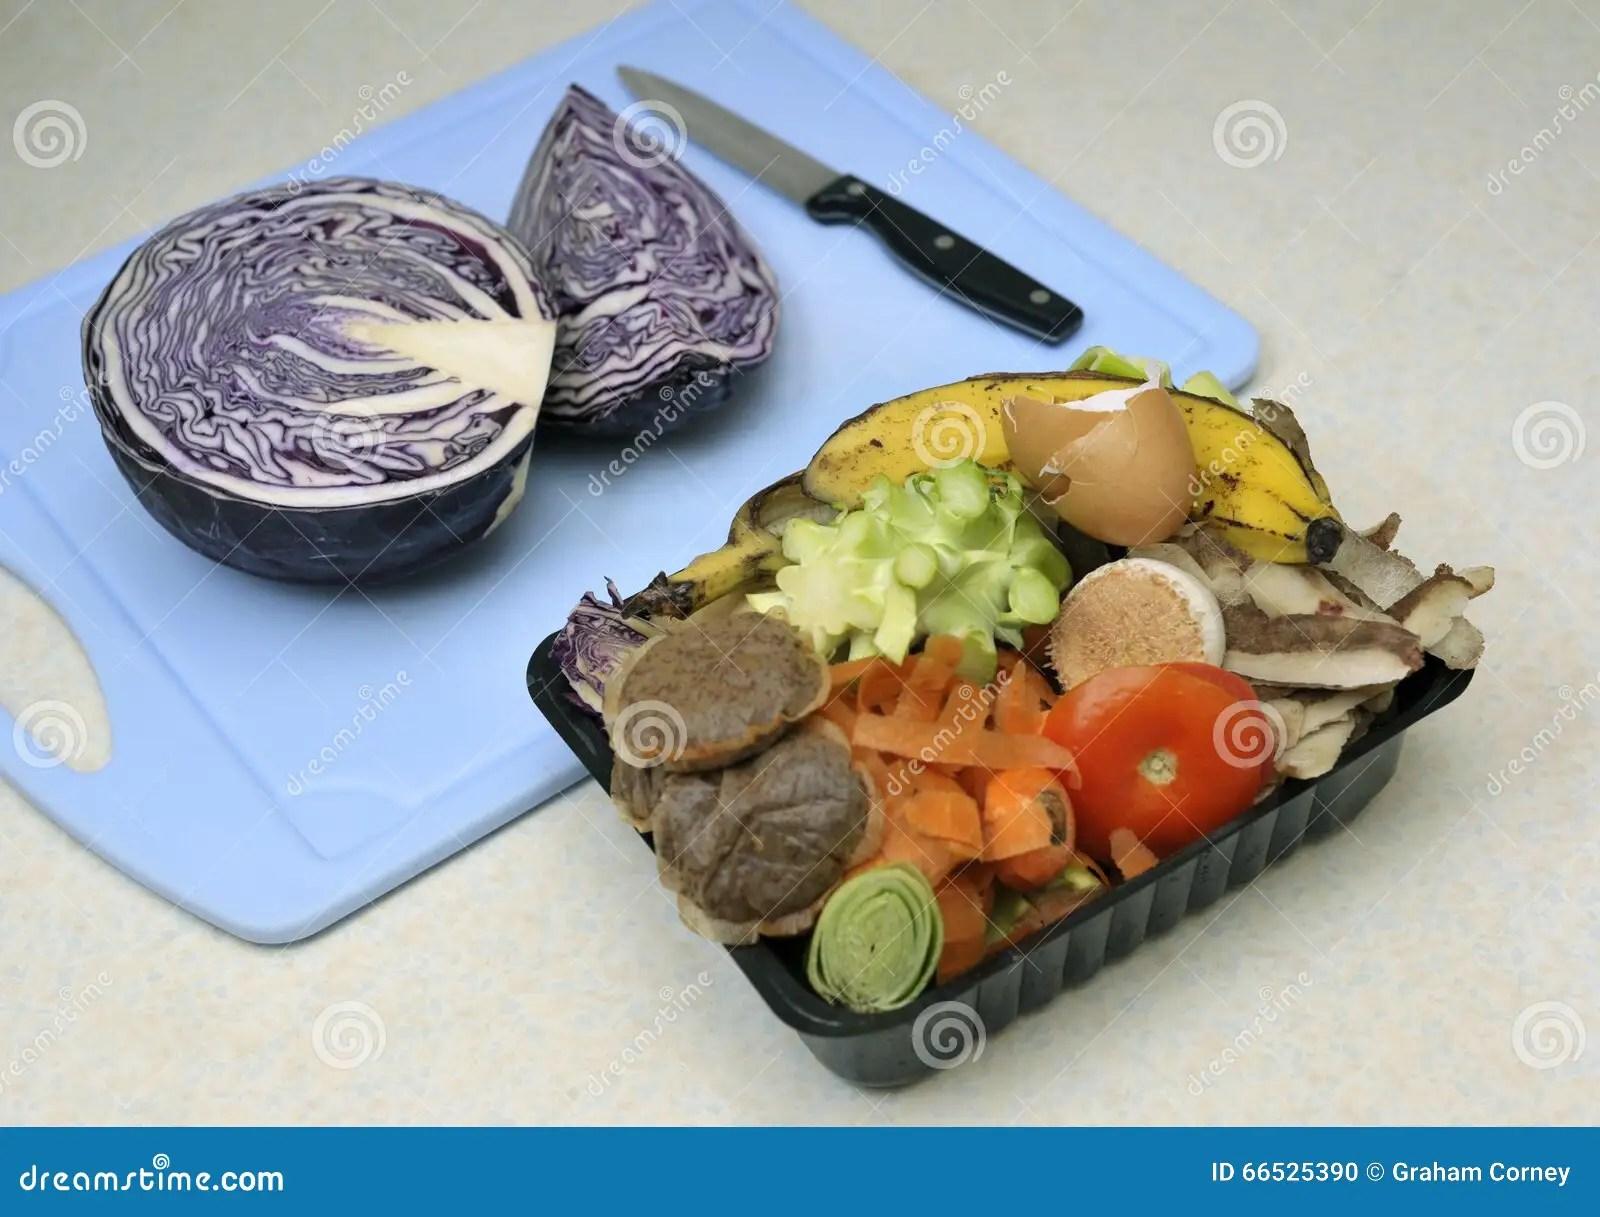 kitchen composter cool gadgets 厨房废纸盒库存照片 图片包括有使用 堆肥 浪费 能承受 家庭 蔬菜 厨房废纸盒